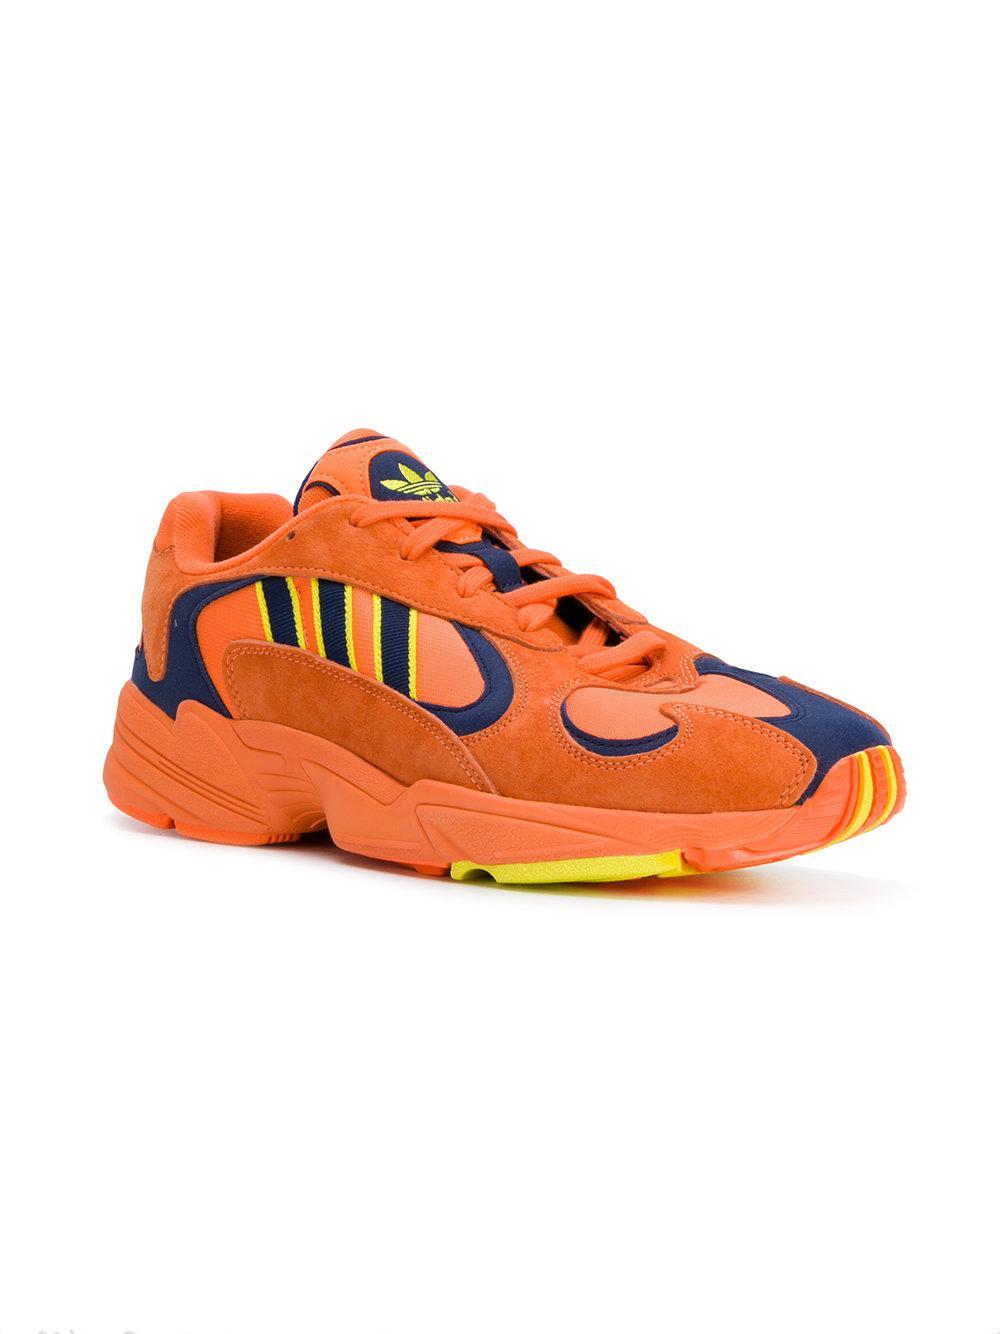 adidas Leather Yung 1 Sneakers in Yellow & Orange (Orange)